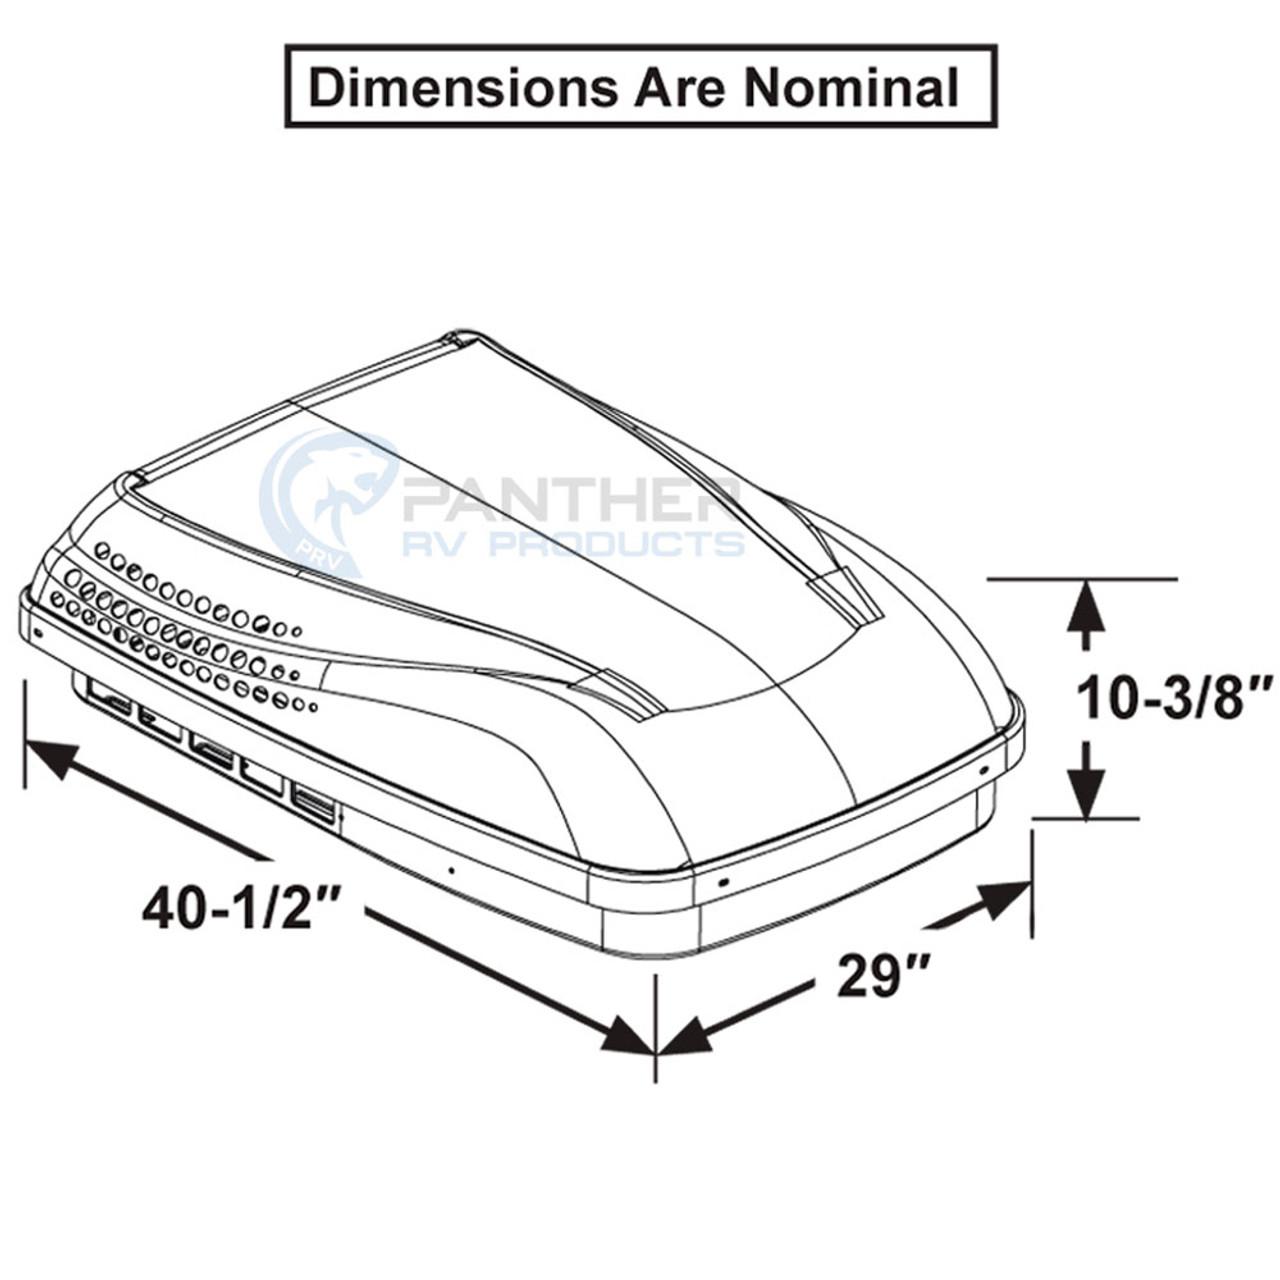 Dometic™ (Duo-Therm) 640310CXX1C0 Penguin II RV Roof Top Air Conditioner  (ADB) White